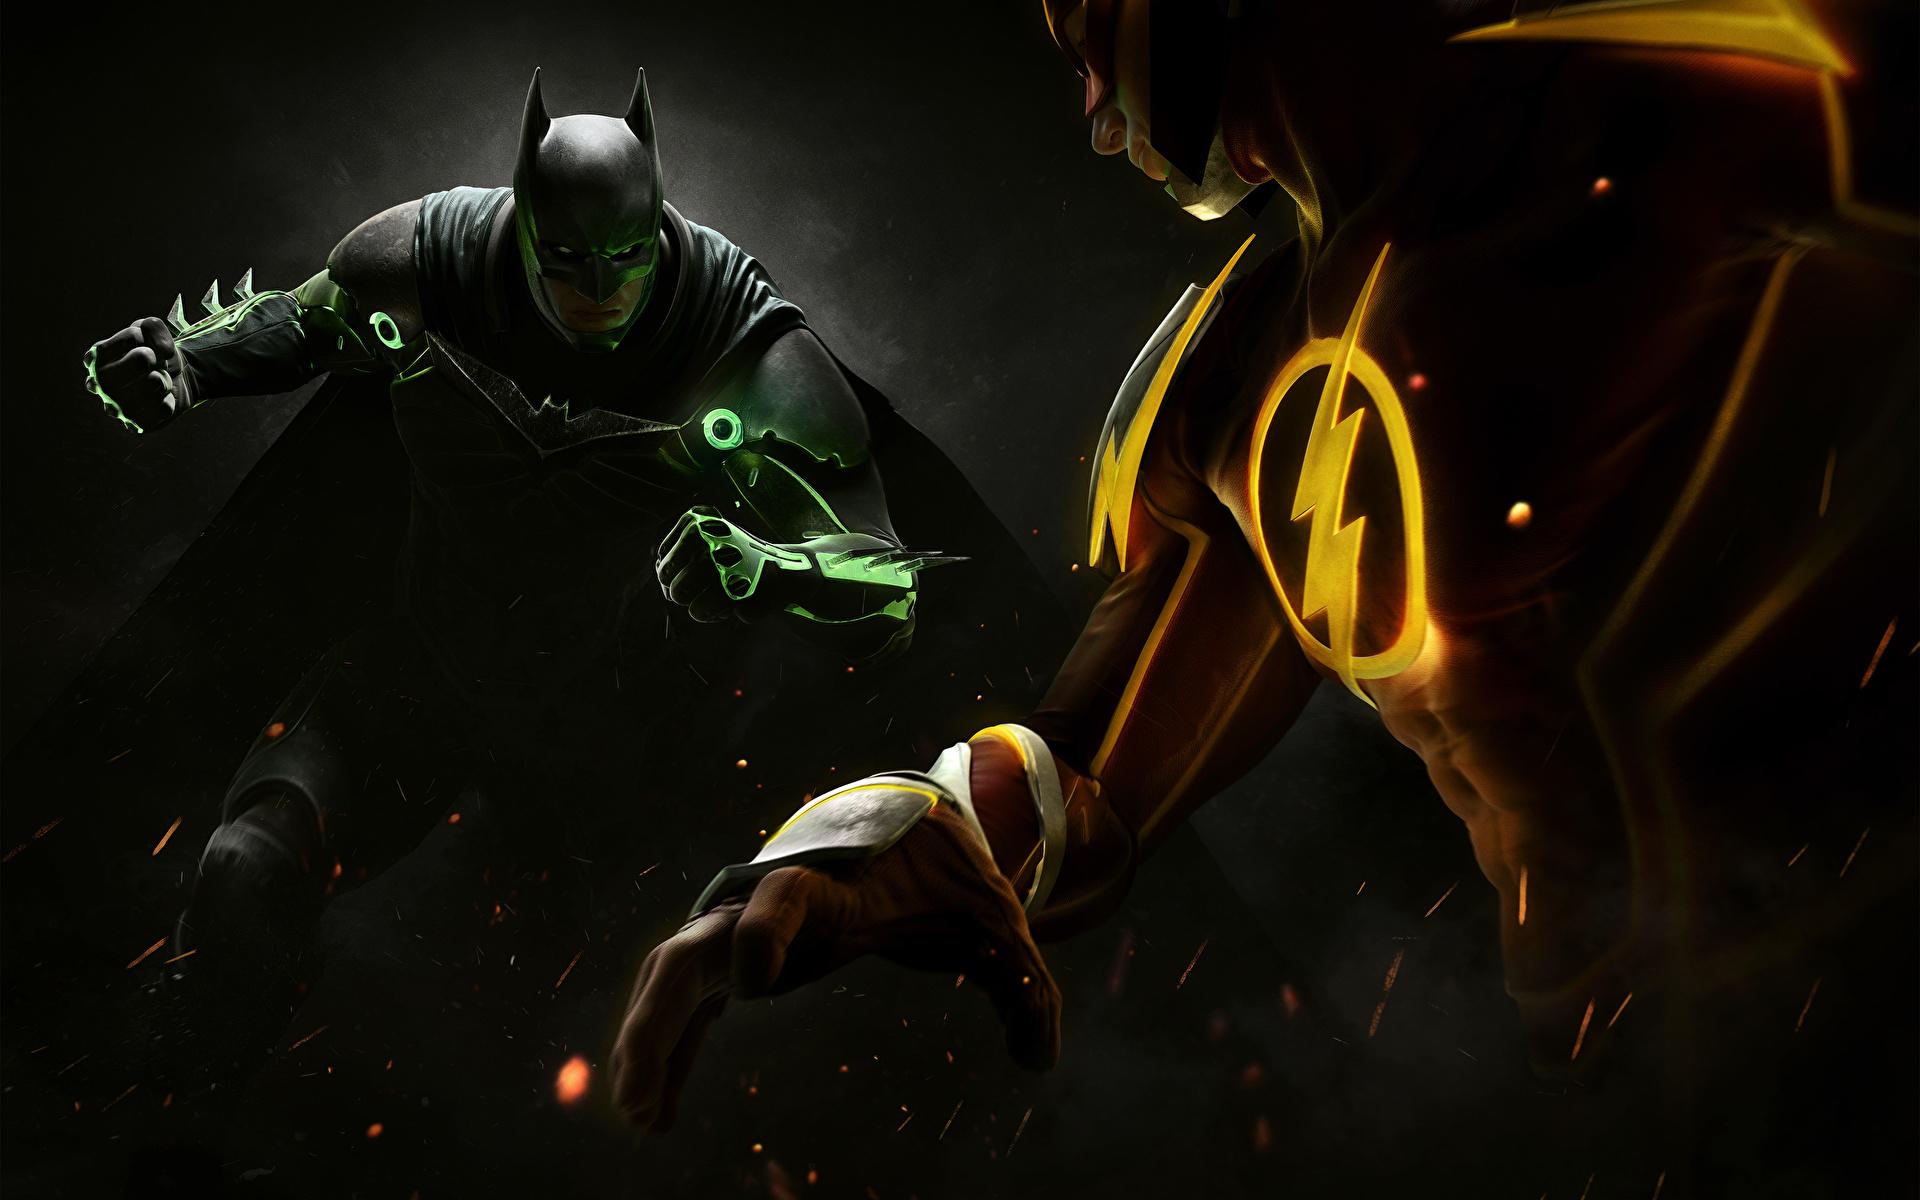 Photos Injustice 2 Heroes comics Batman hero The Flash hero vdeo game 1920x1200 superheroes Games